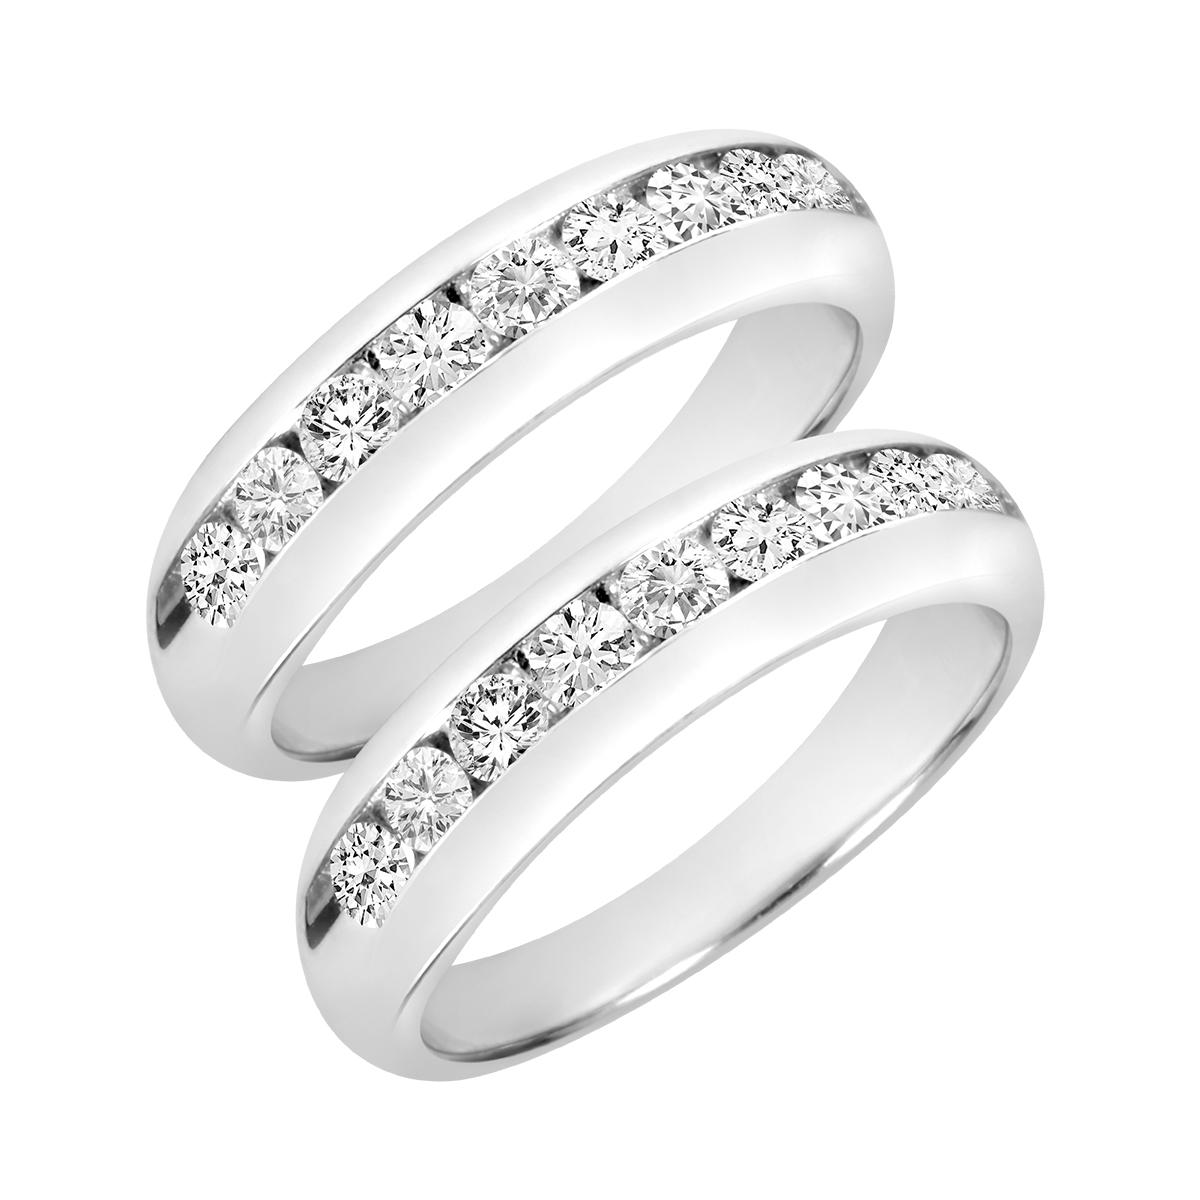 2 Carat T.W. Round Cut Mens  Same Sex Wedding Band Set 10K White Gold- Size 8